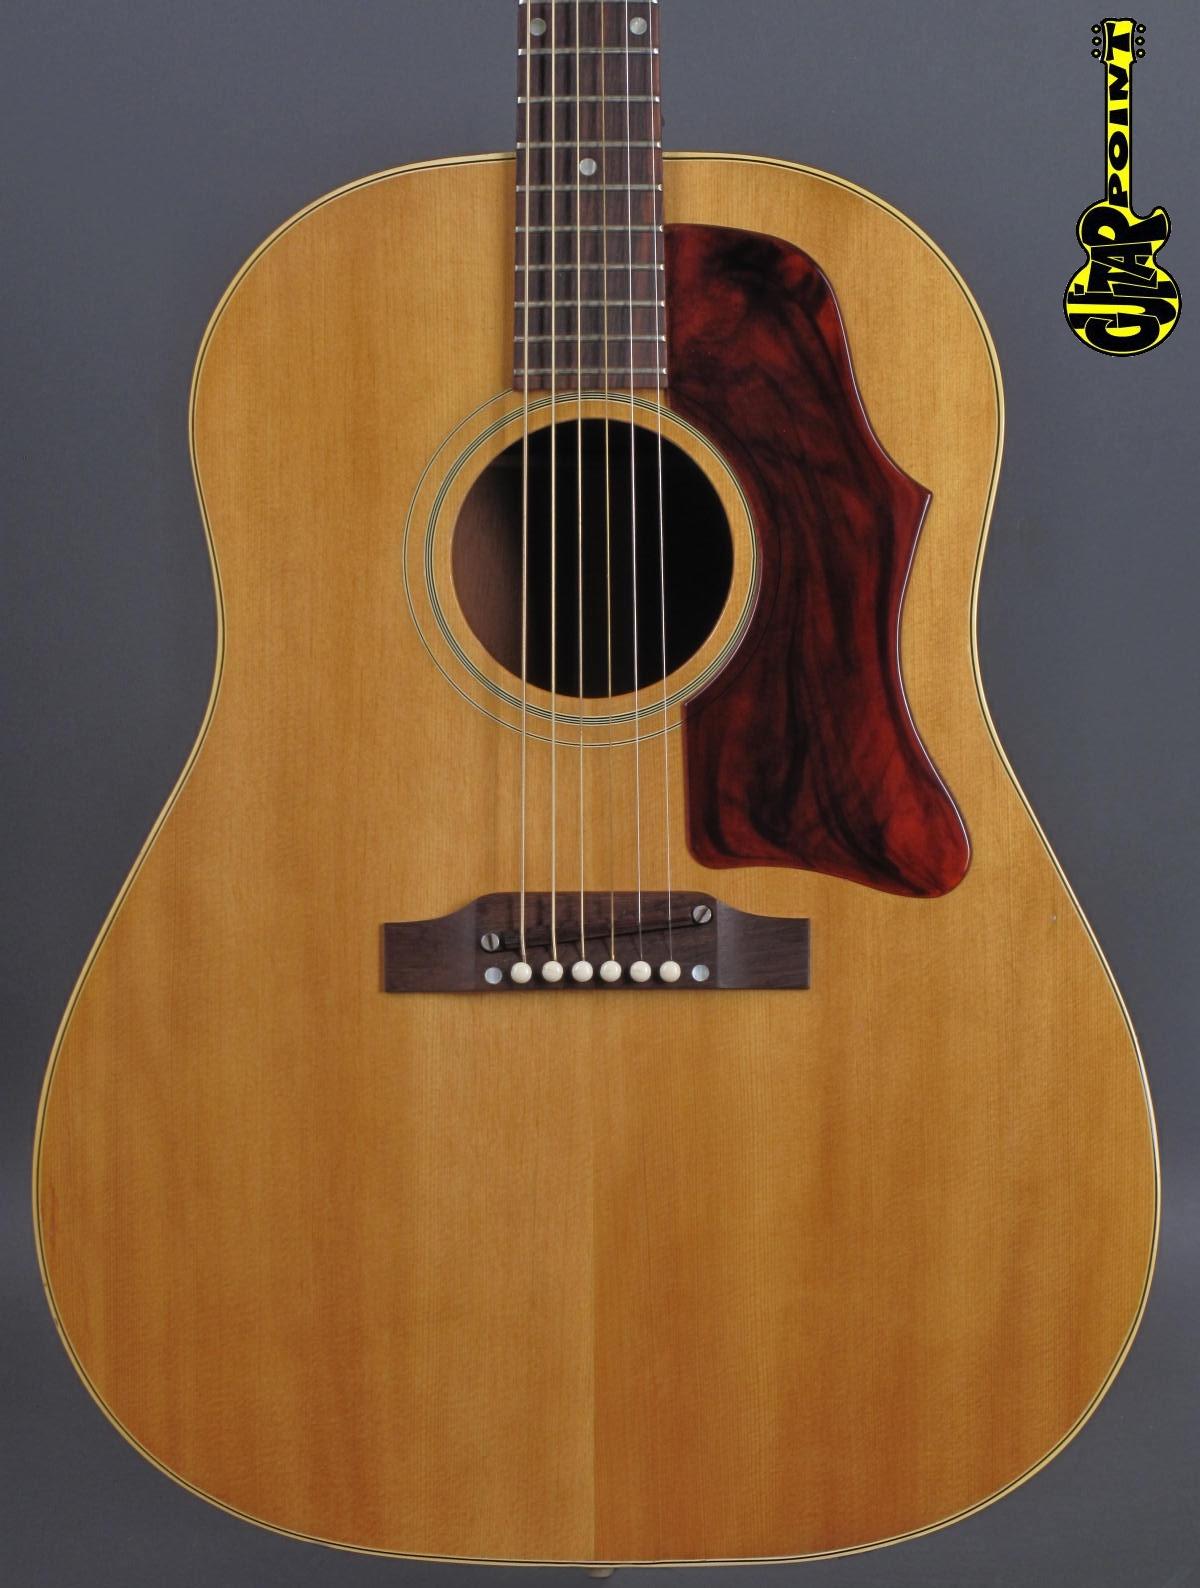 1964 Gibson J-50 - Natural